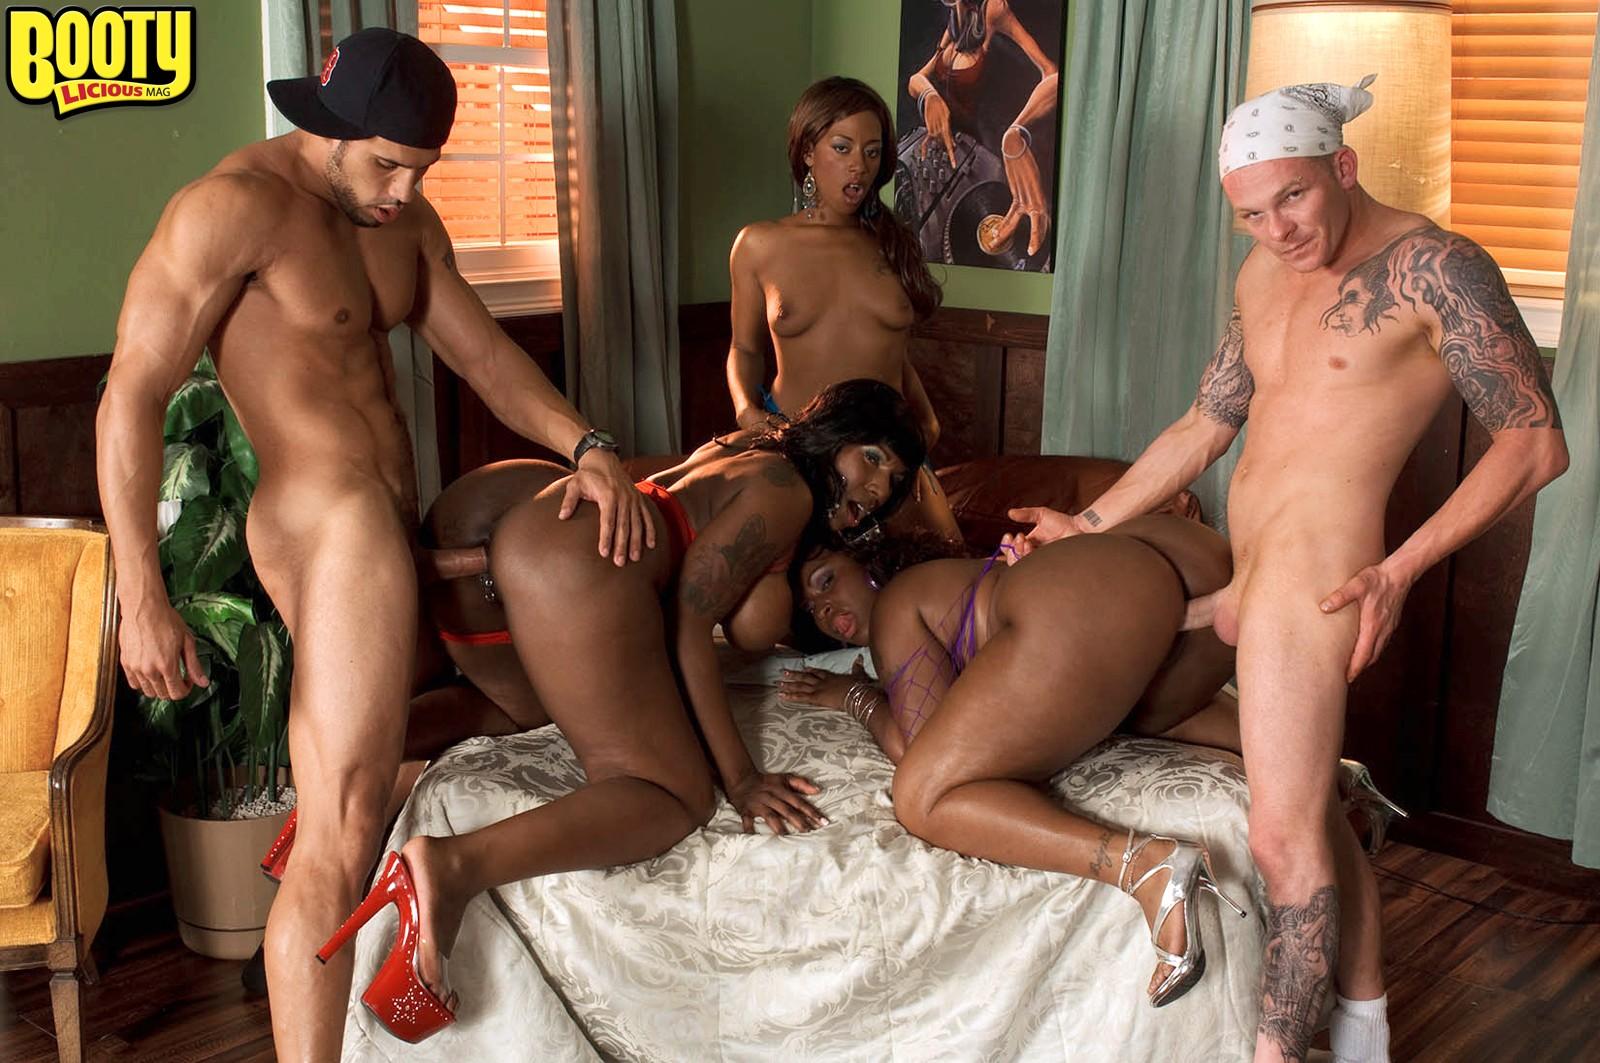 Sexy ebony girl with big booty fucked doggystyle free ebony porn